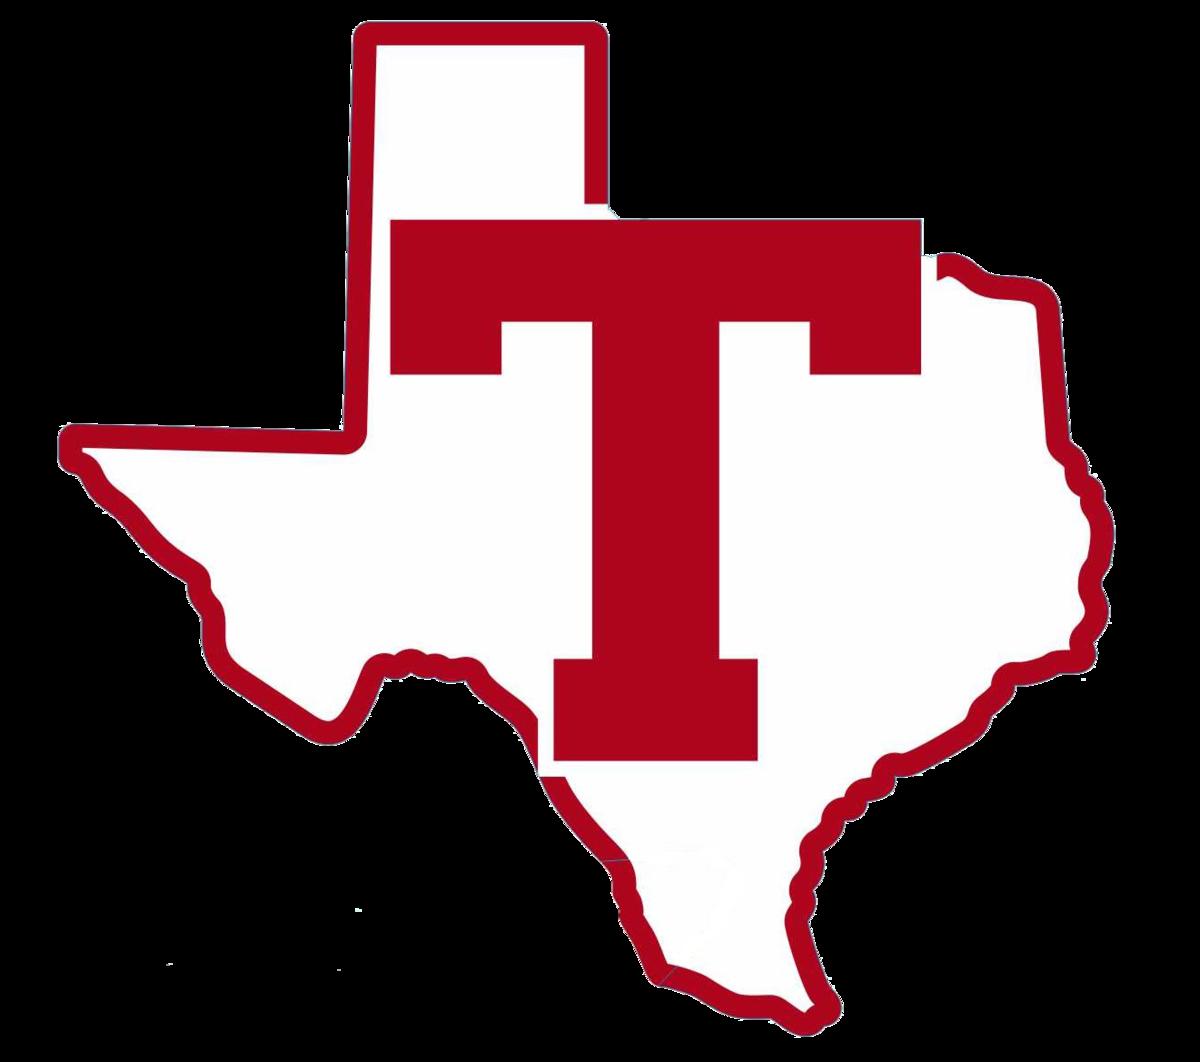 Texas T logo